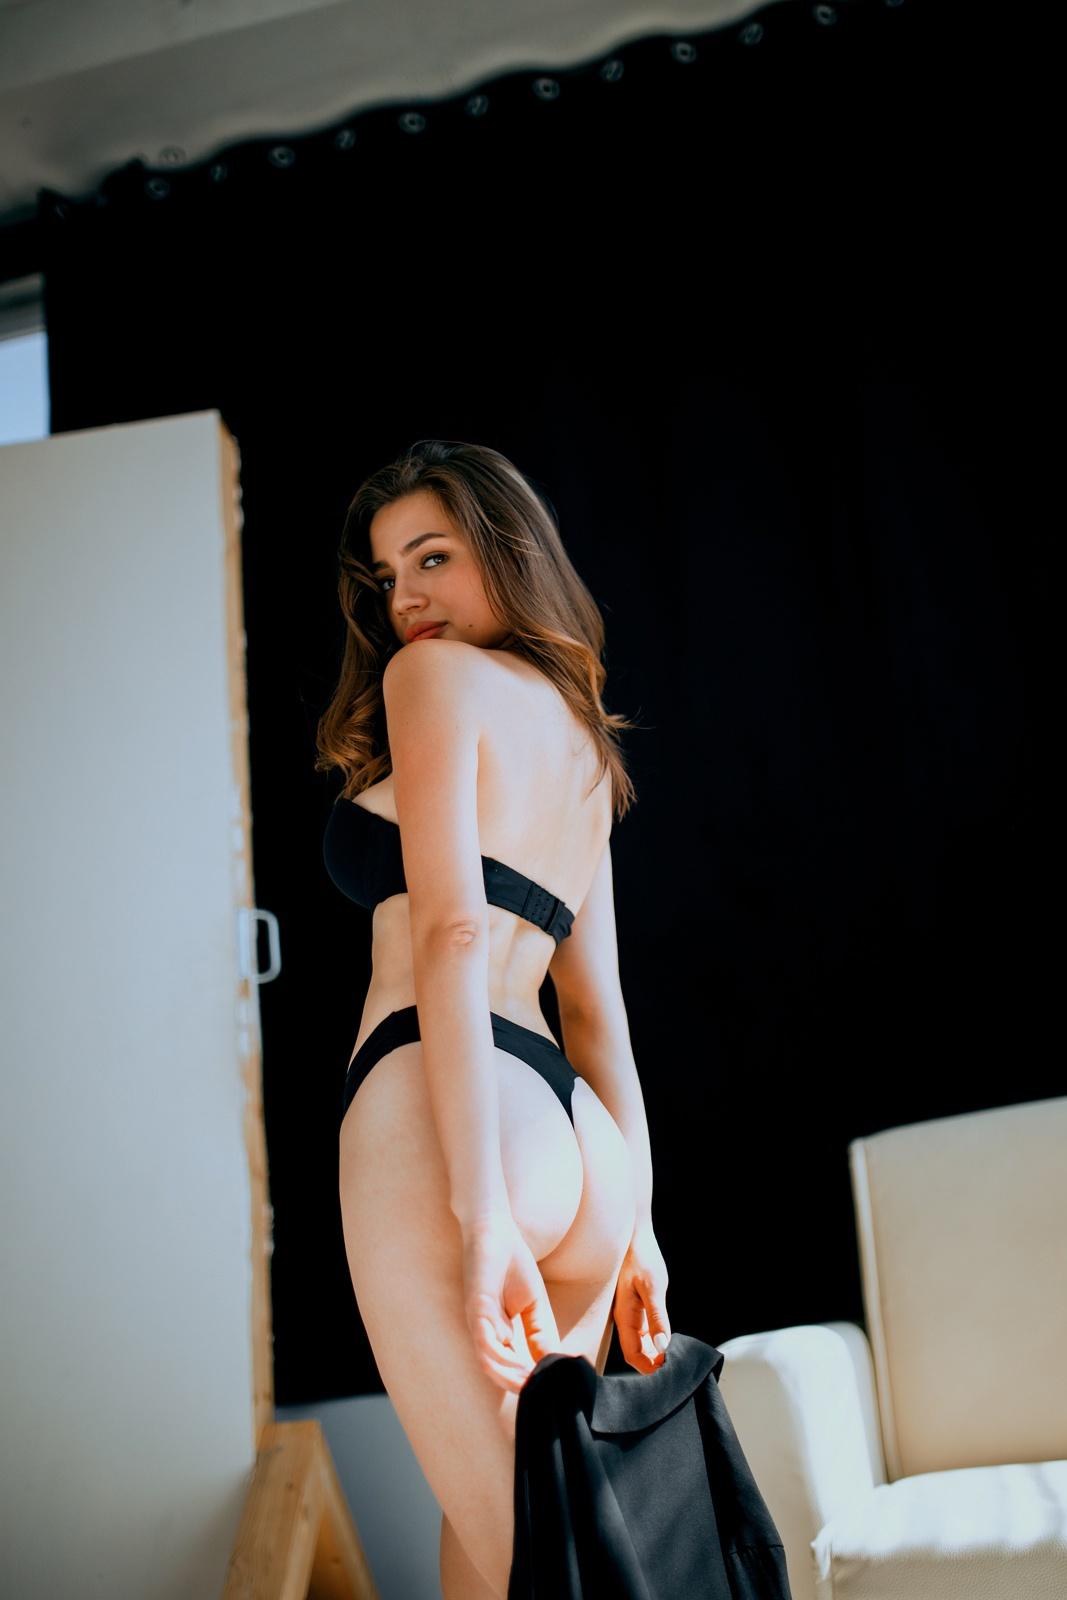 https://www.youngfolks.ru/pub/model-alina-alina-photographer-lenar-abdrakhmanov